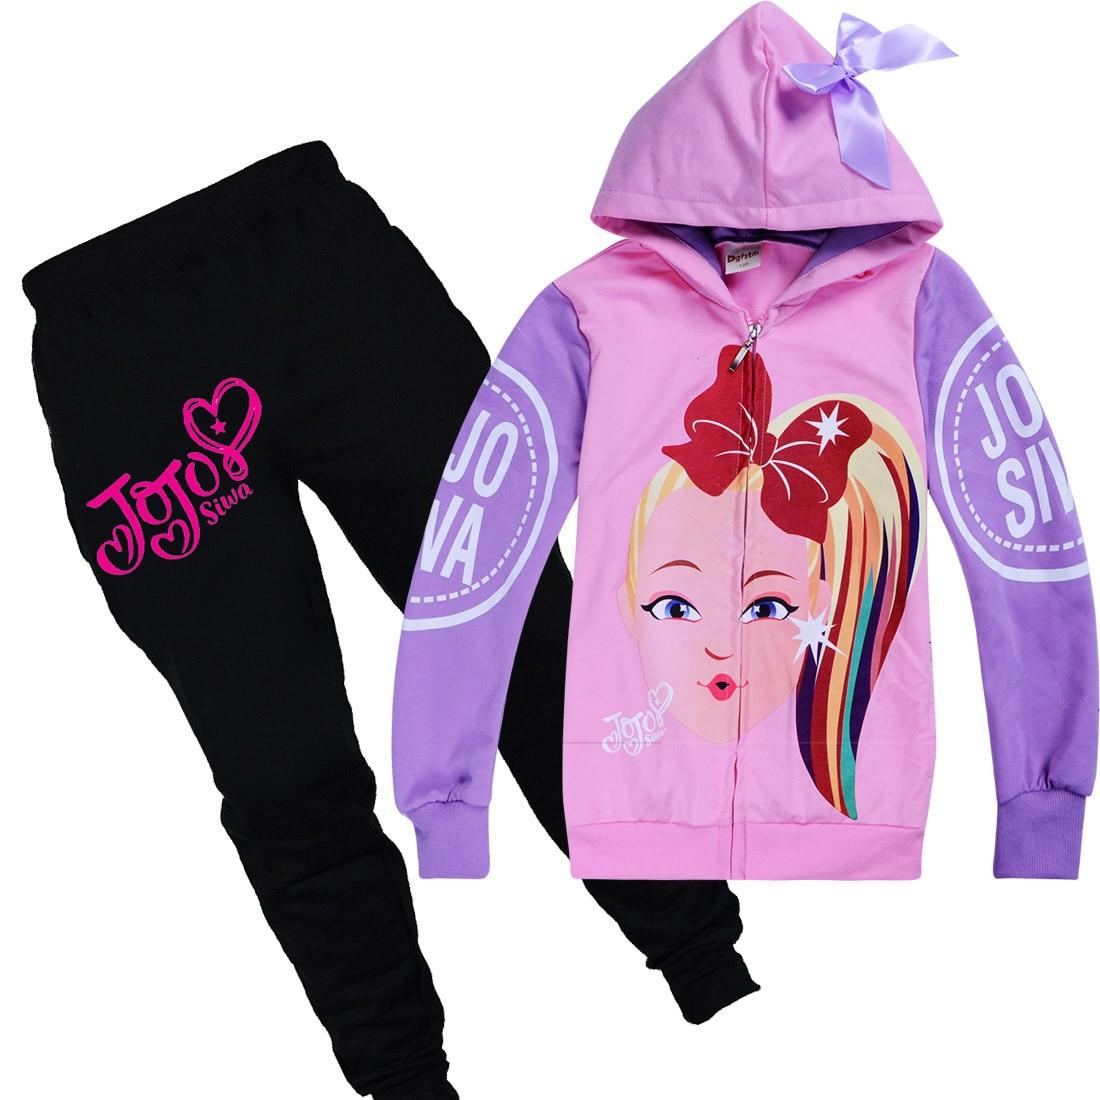 Jojo Siwa Girls Hooded Hoodies Casual Cartoon  Kids SweatShirts+Pants Outfits